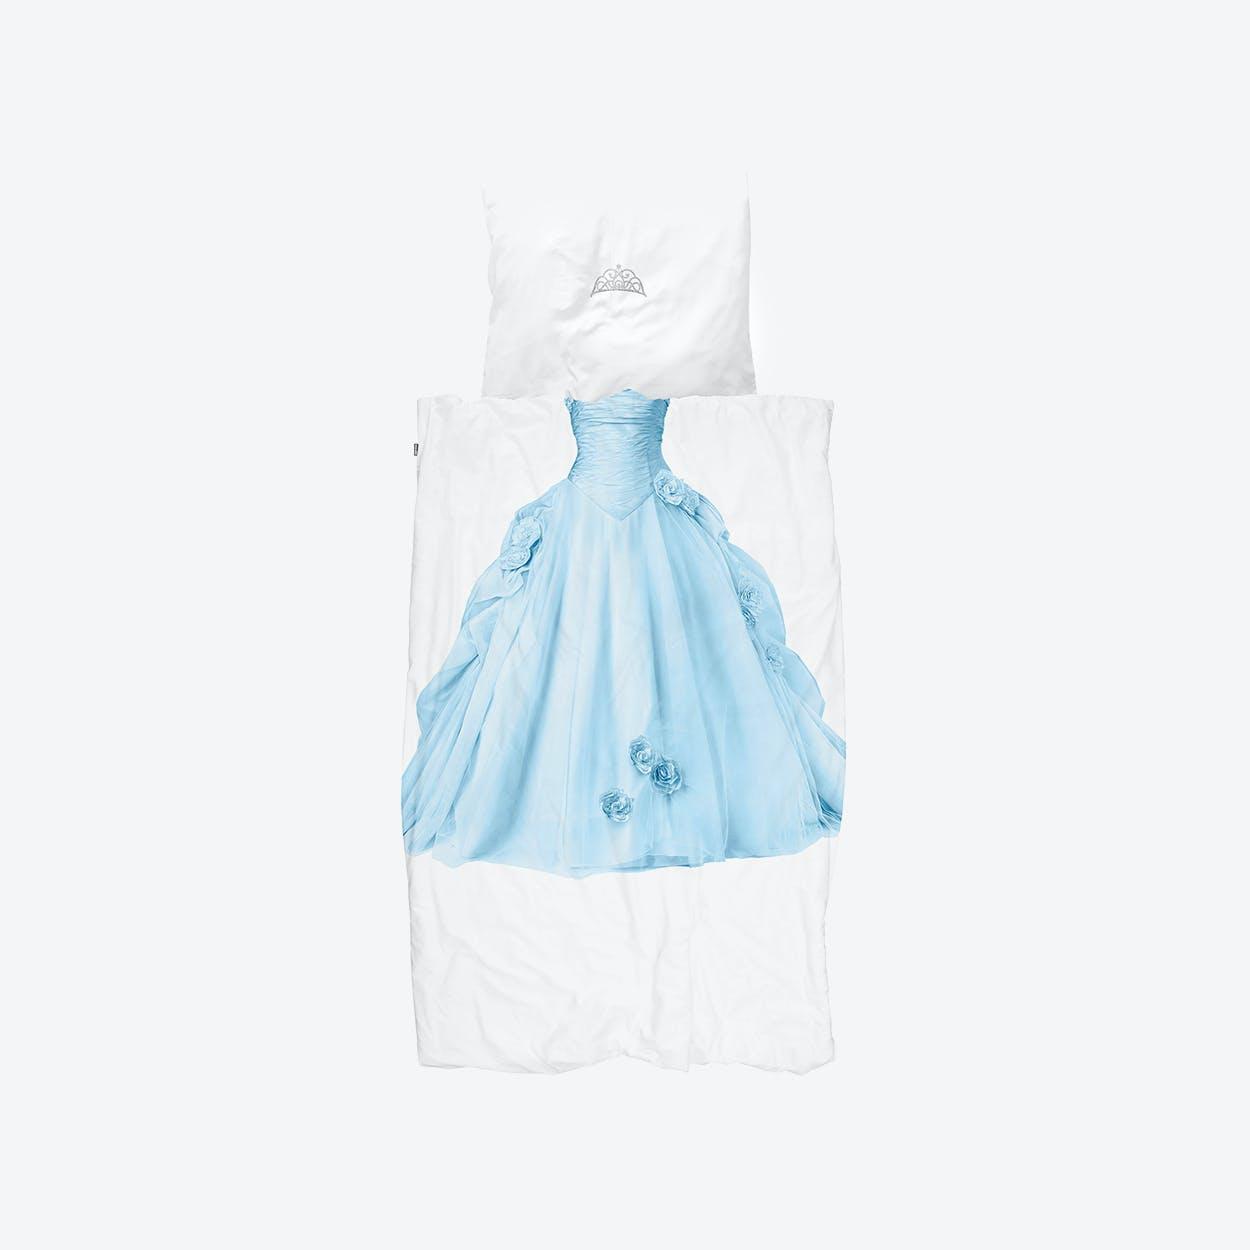 Princess Duvet Cover & Pillowcase Set in Blue